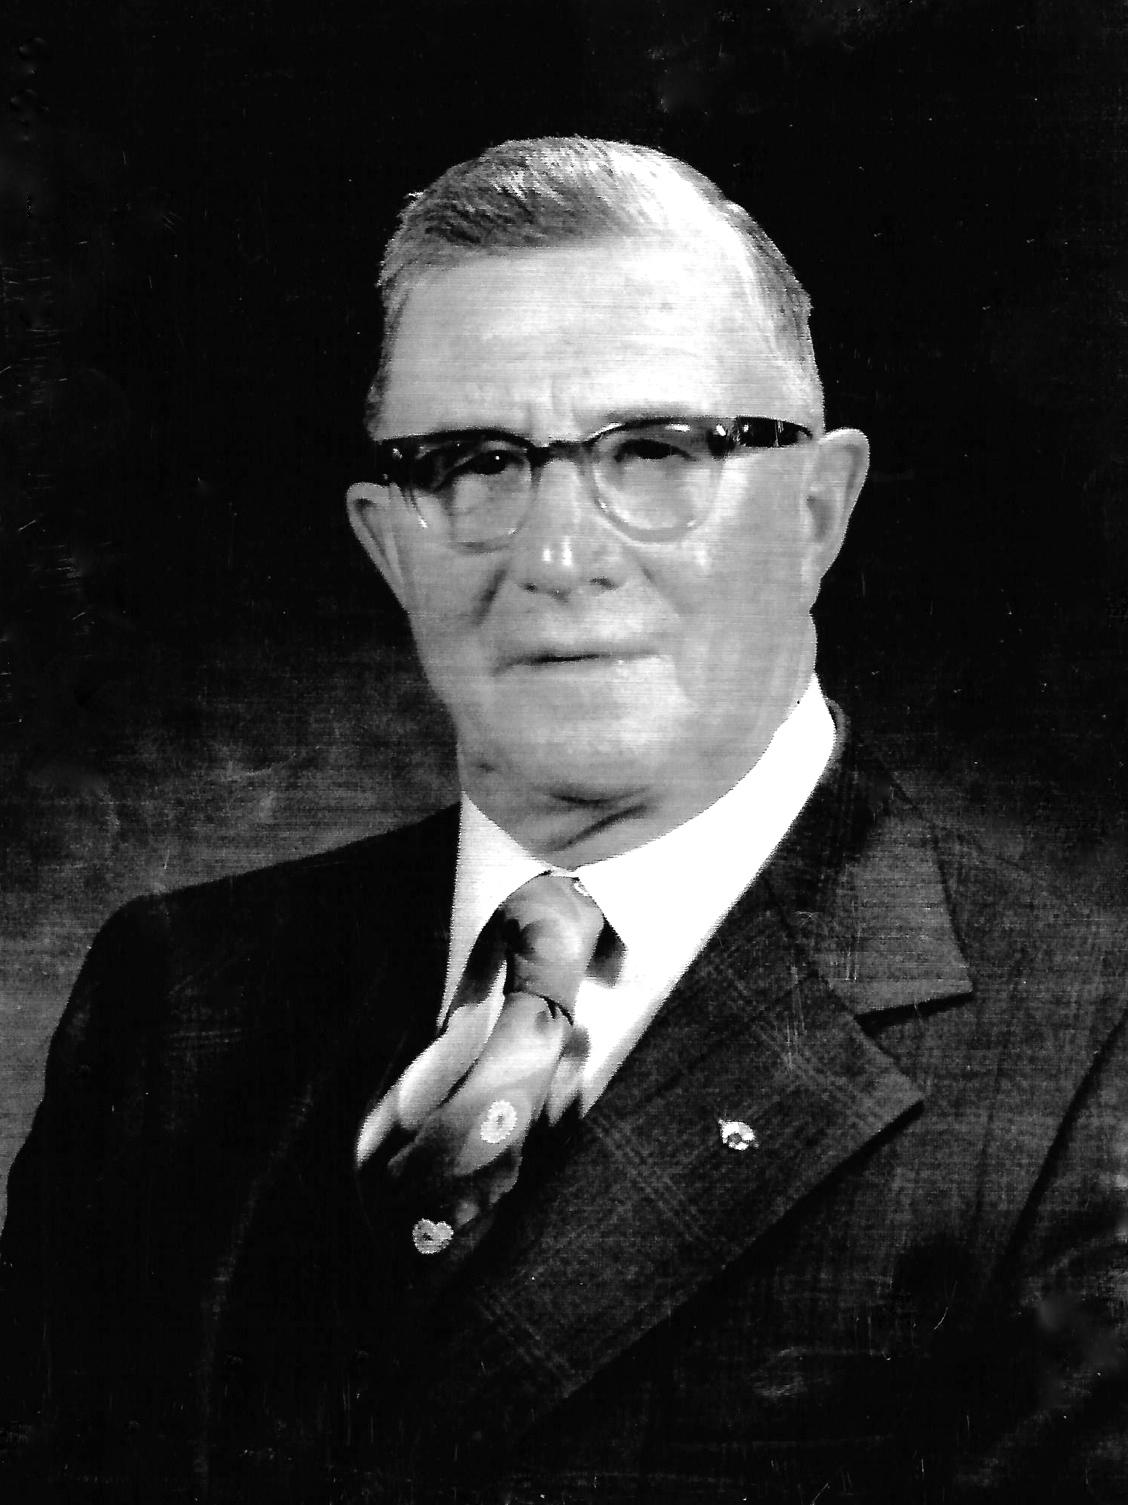 Allan Bruce Caughay